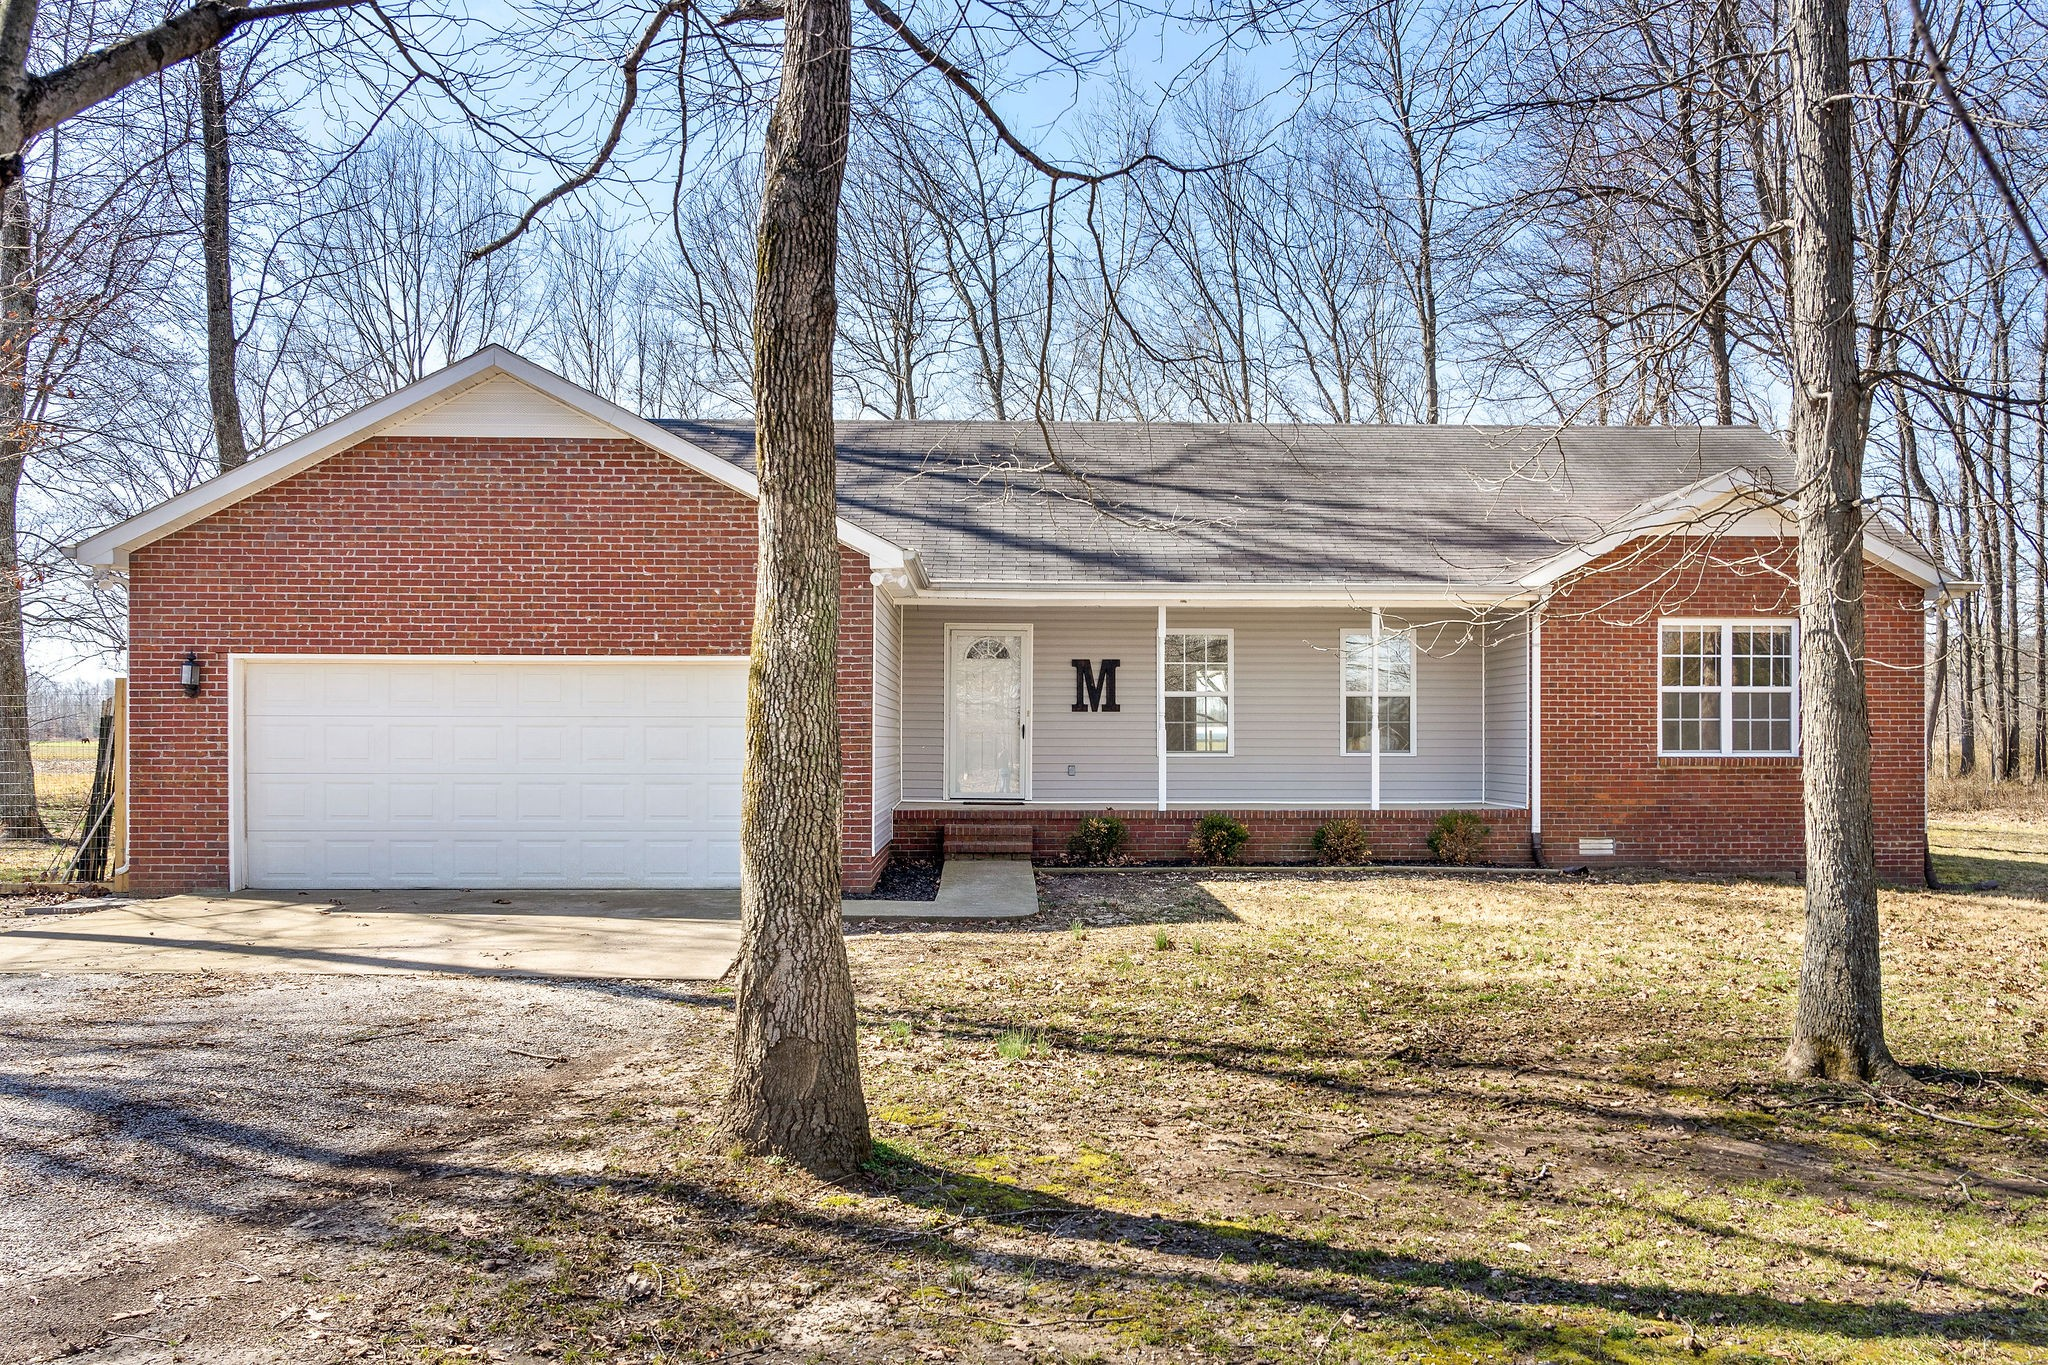 2276 Flat Lick Ln Property Photo - Herndon, KY real estate listing